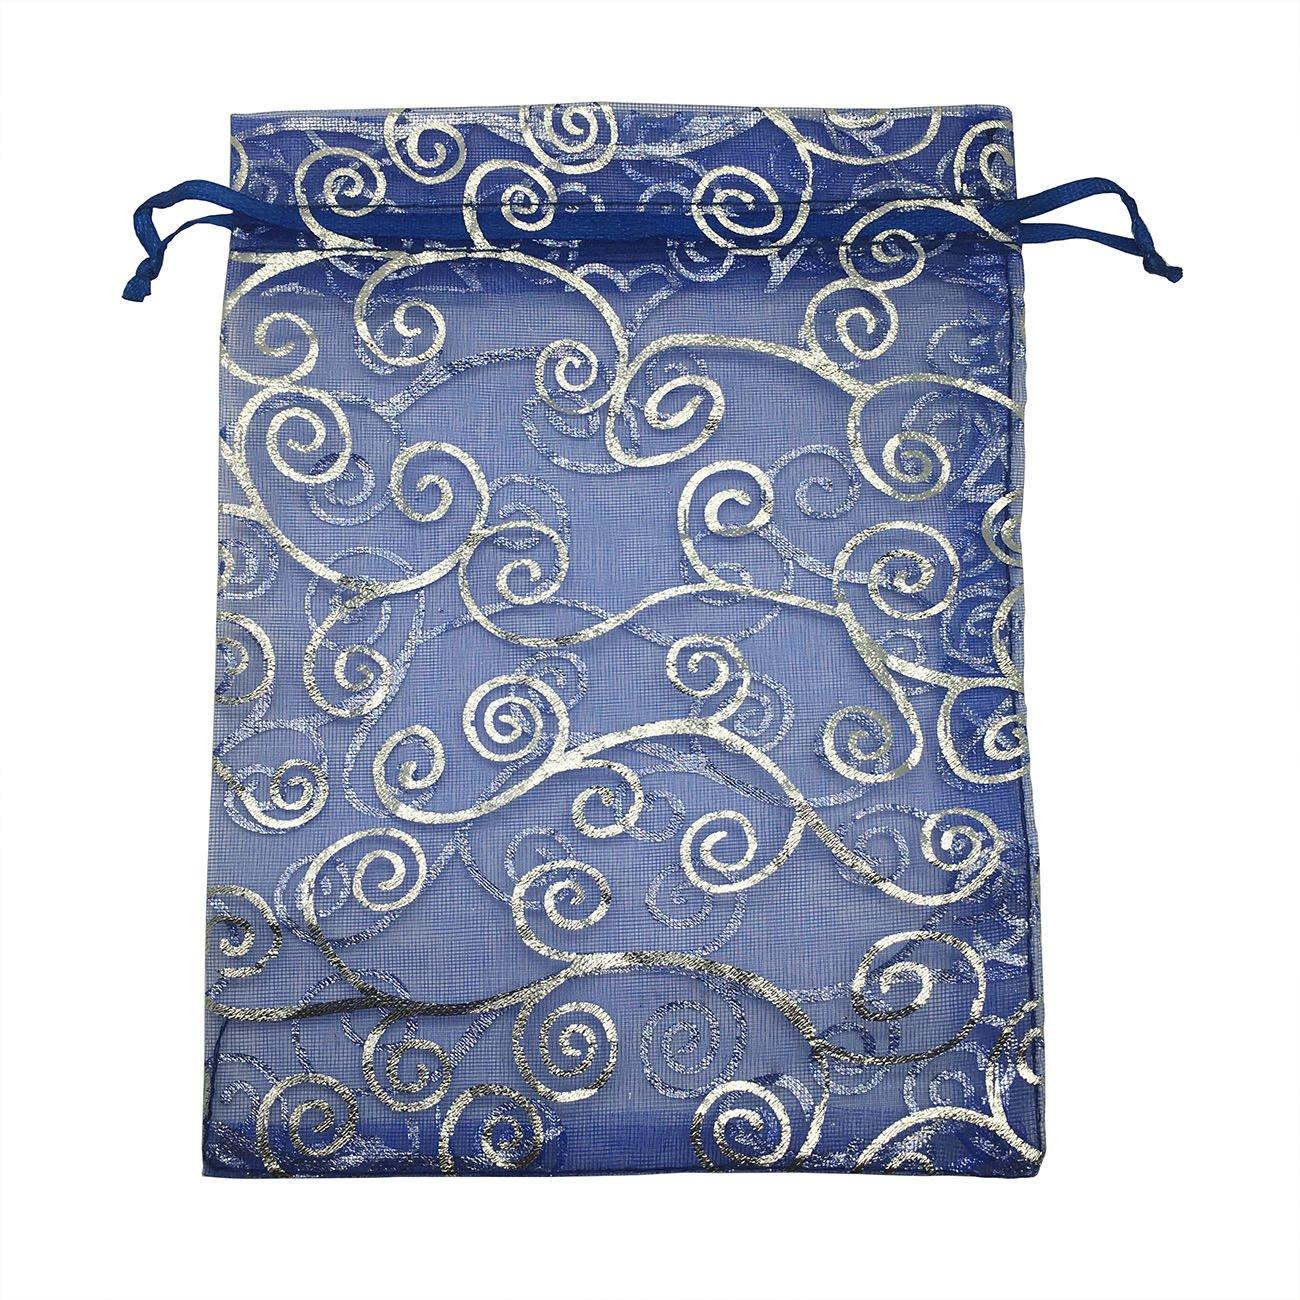 Sosam 100PCS 4x6'' (10x15cm) Drawstring Organza Jewelry Favor Pouches Wedding Party Festival Gift Bags Candy Bags (4x6'' (10x15cm), Blue Silver)